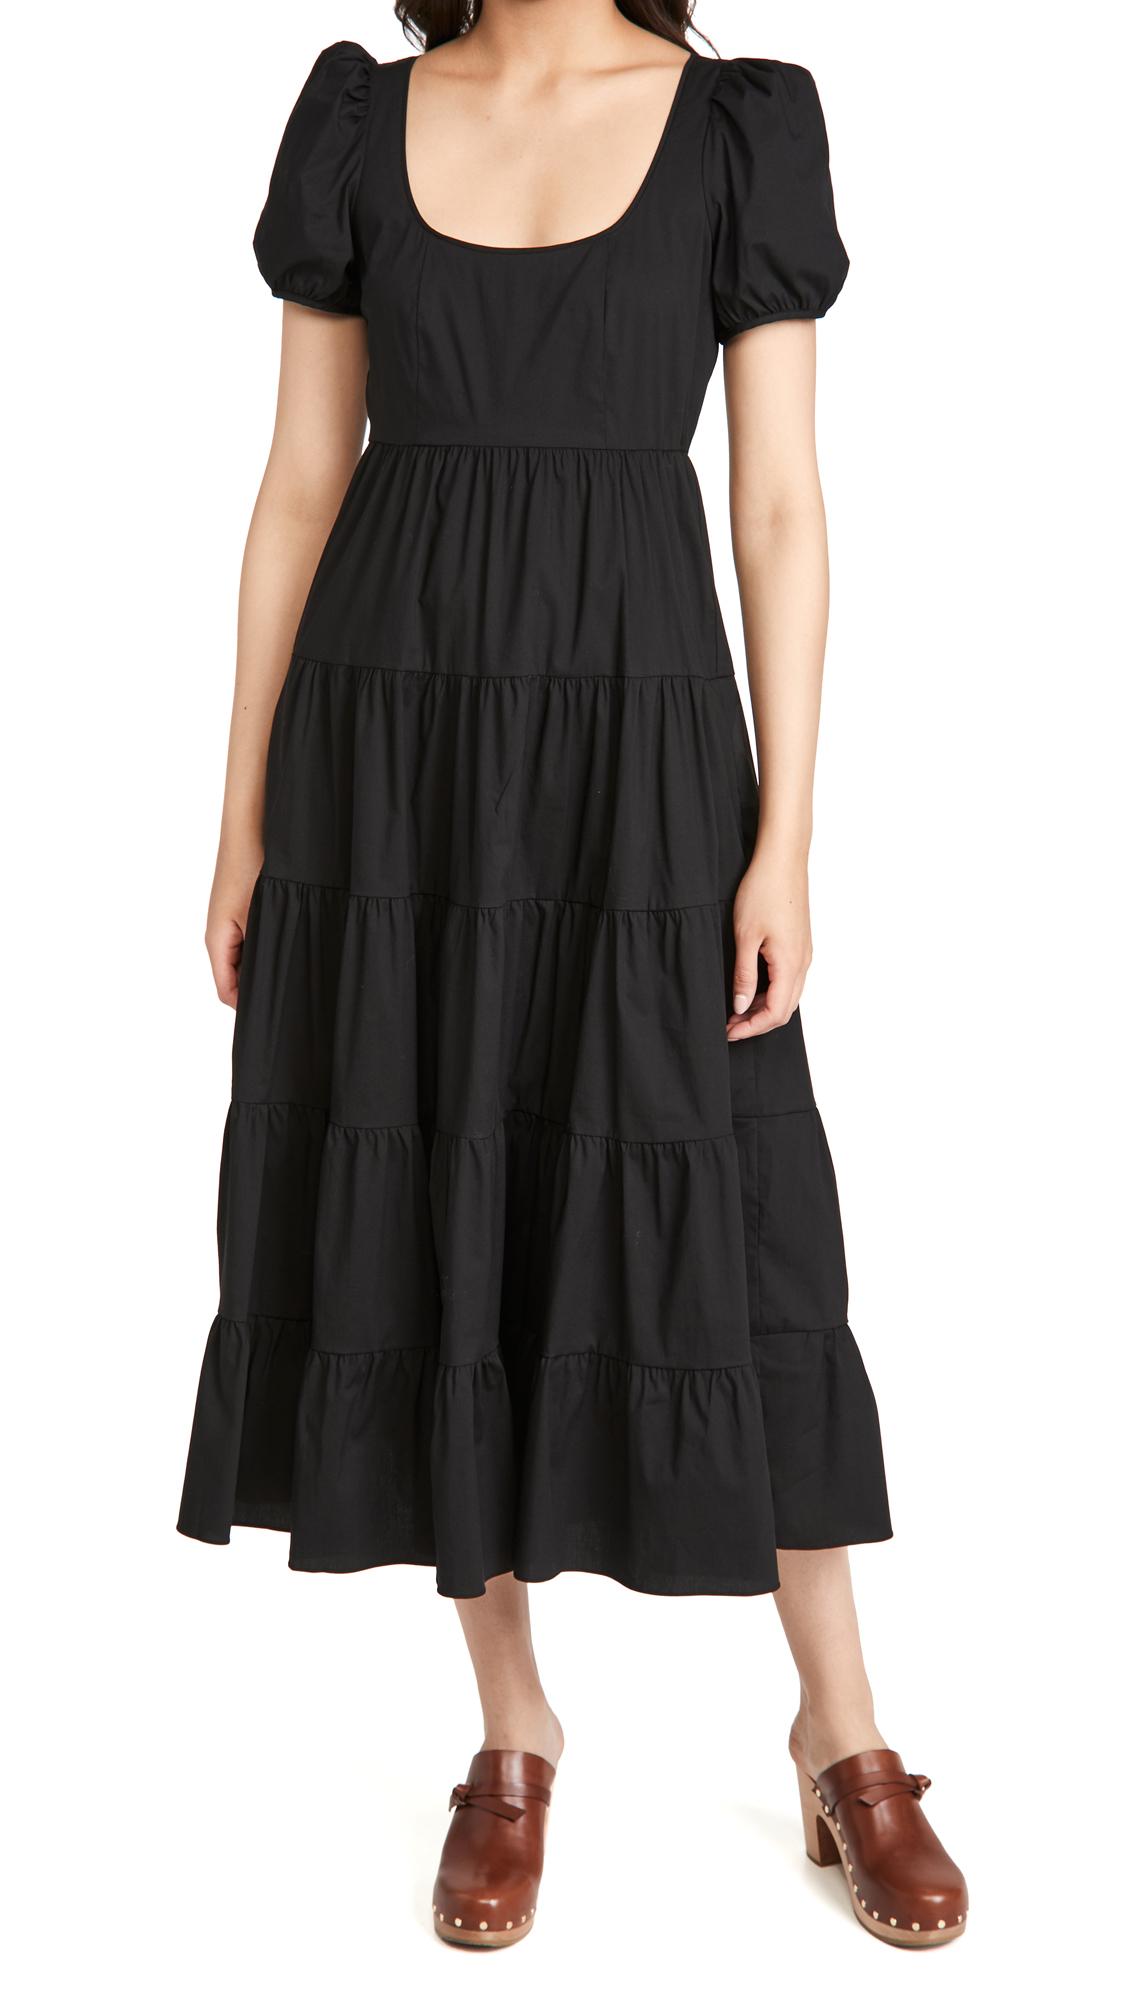 LIKELY Chloe Dress